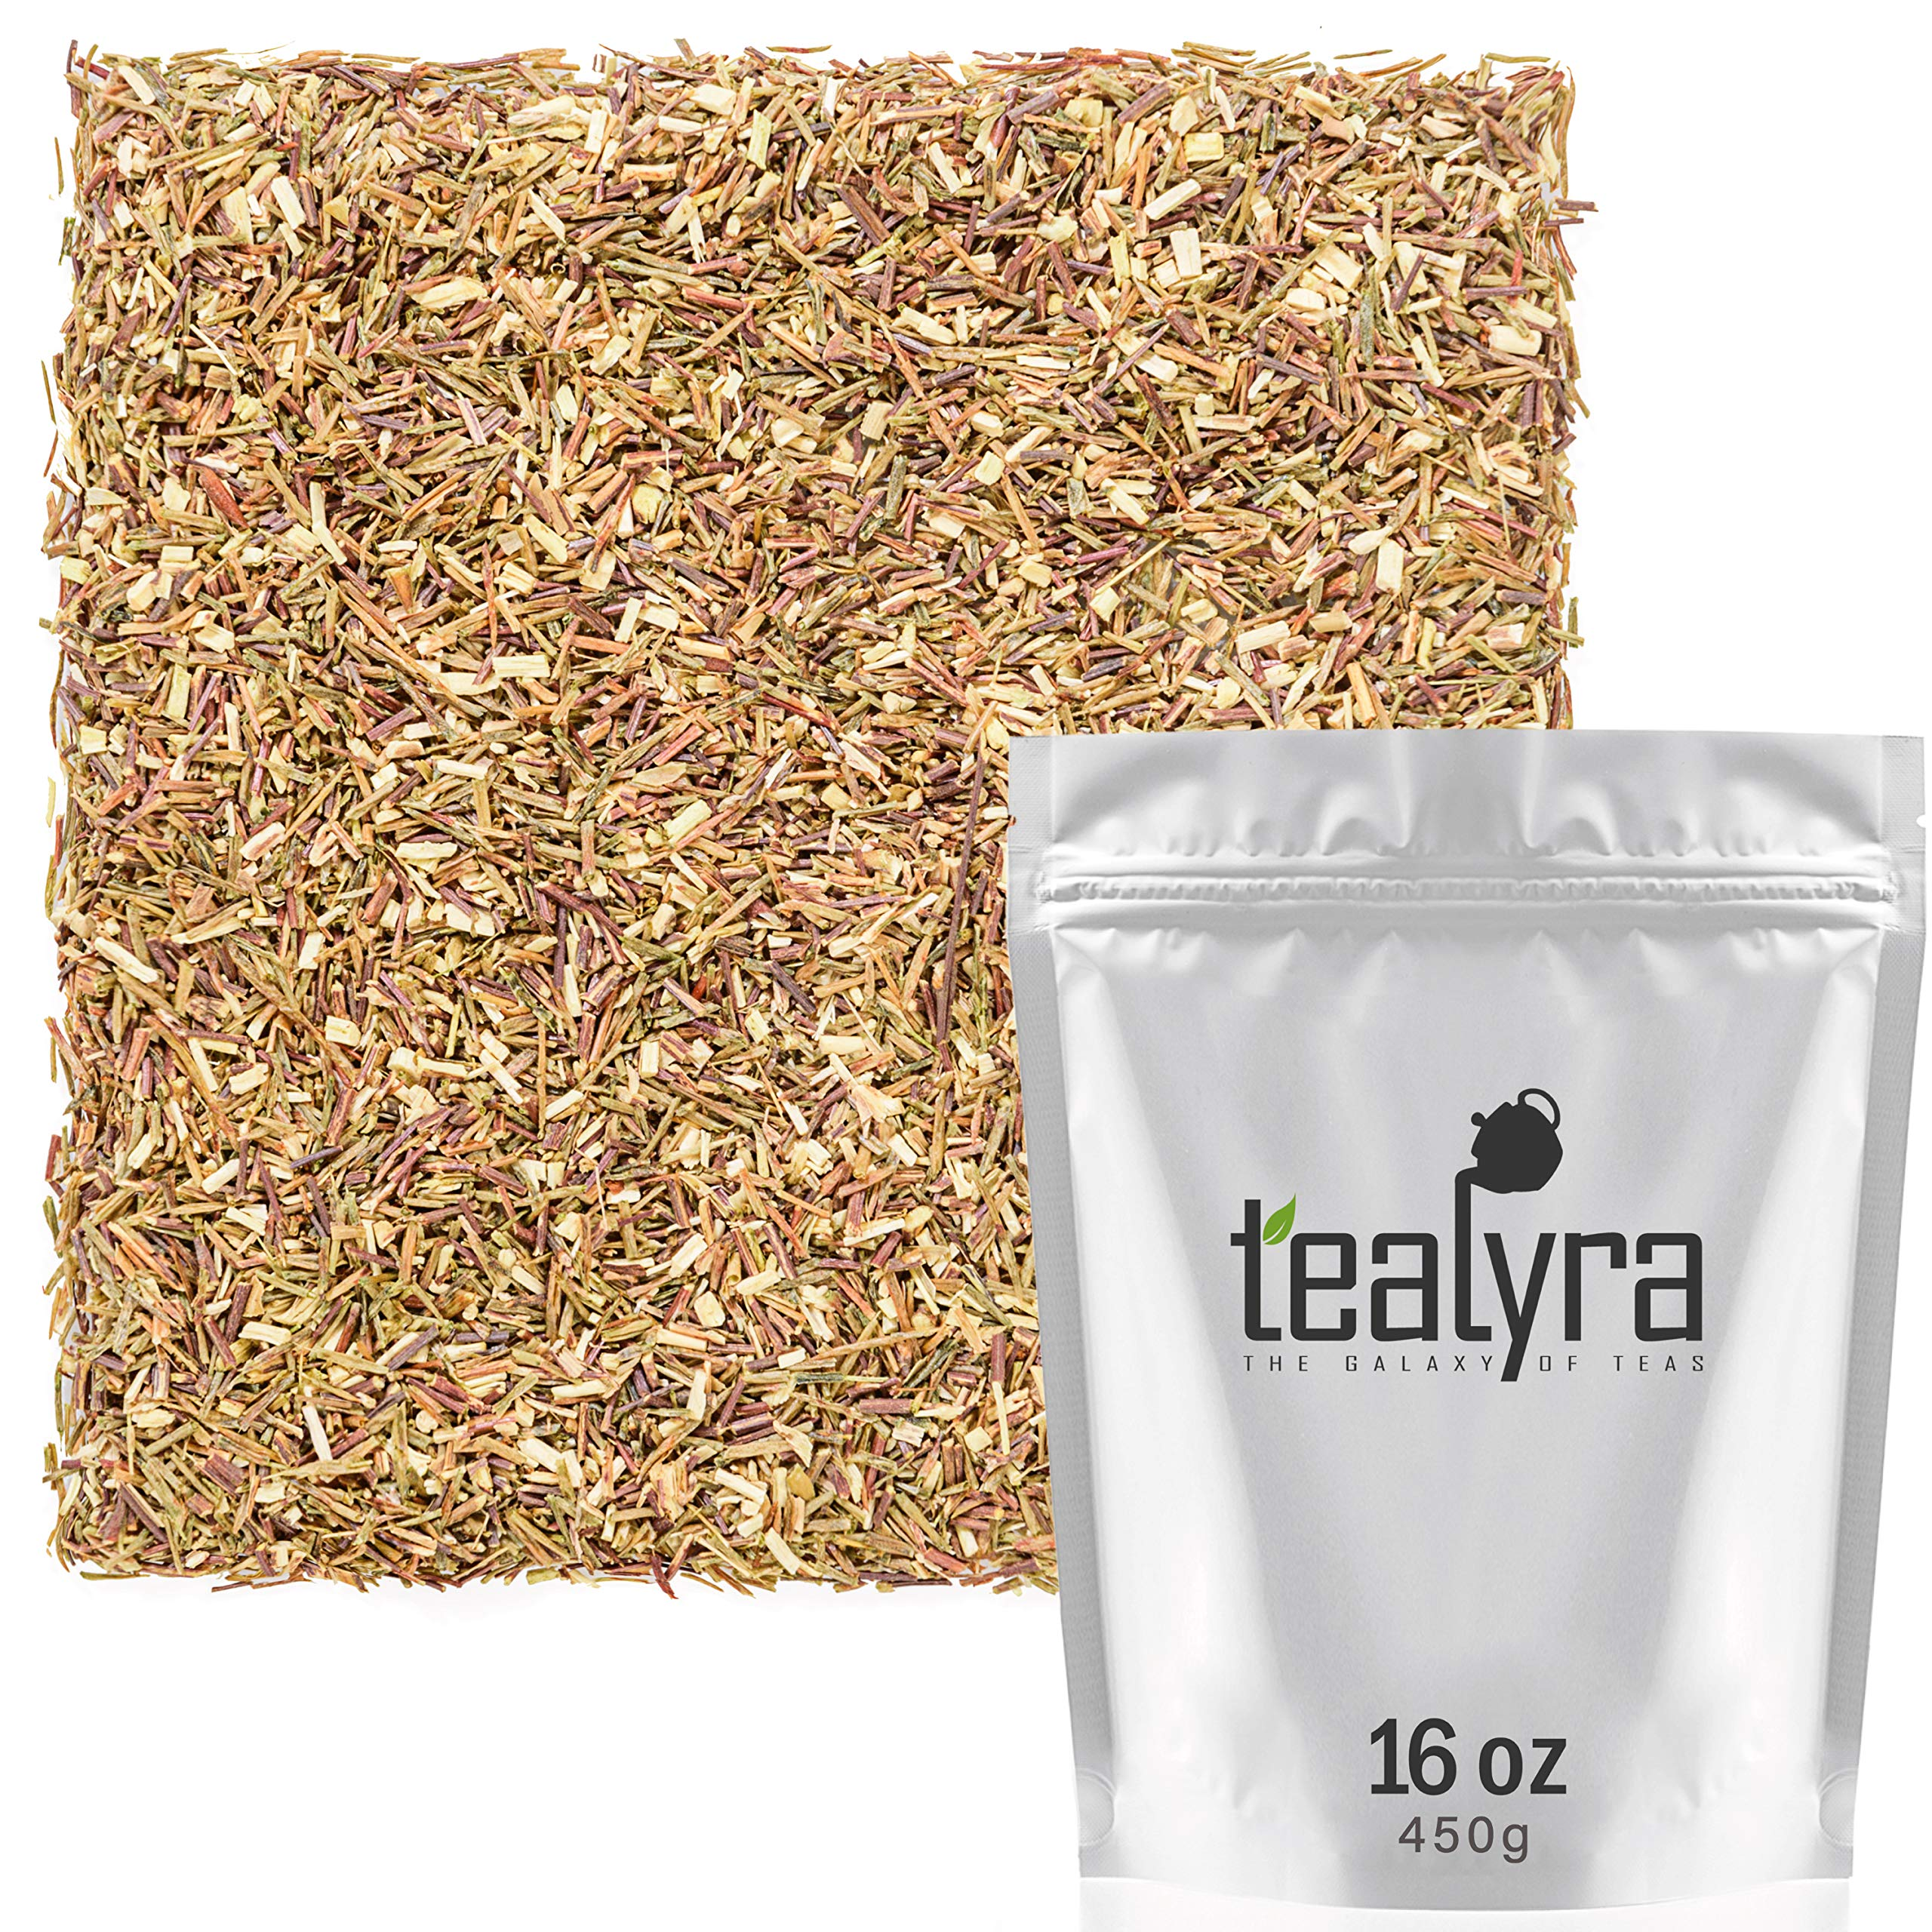 Tealyra - Green Rooibos - Pure Herbal Loose Leaf Tea - Antioxidants Rich - Relaxing Tea - Caffeine-Free - Organically Grown - 450g (16-ounce) by Tealyra